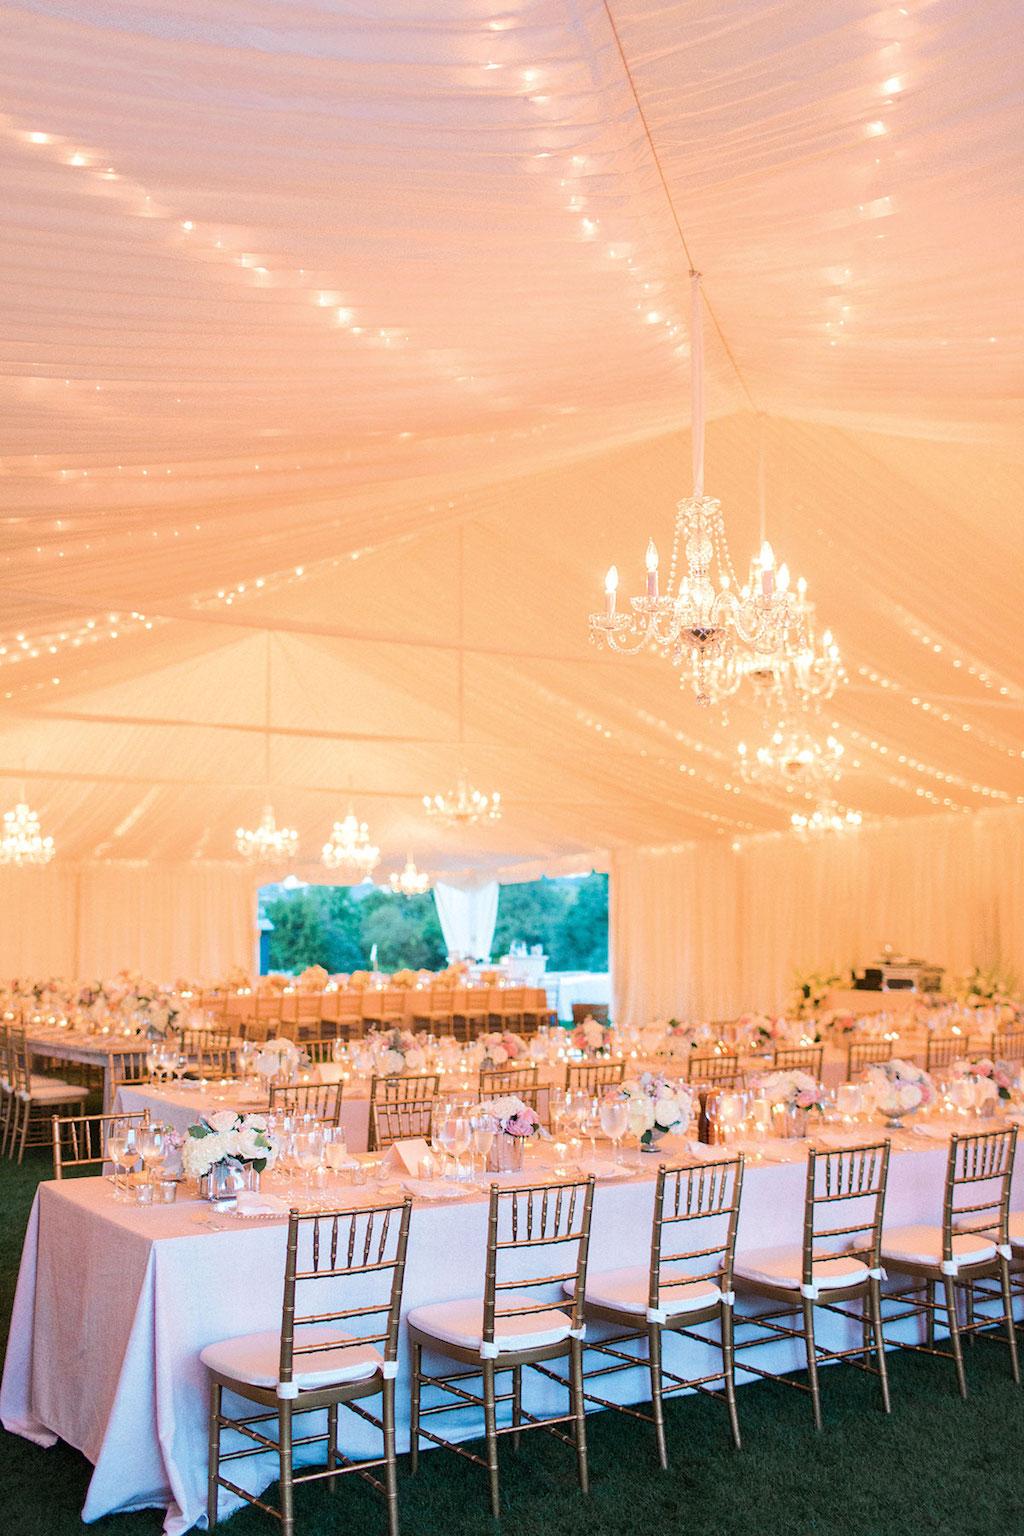 10-11-16-coolest-wedding-decor-design-15